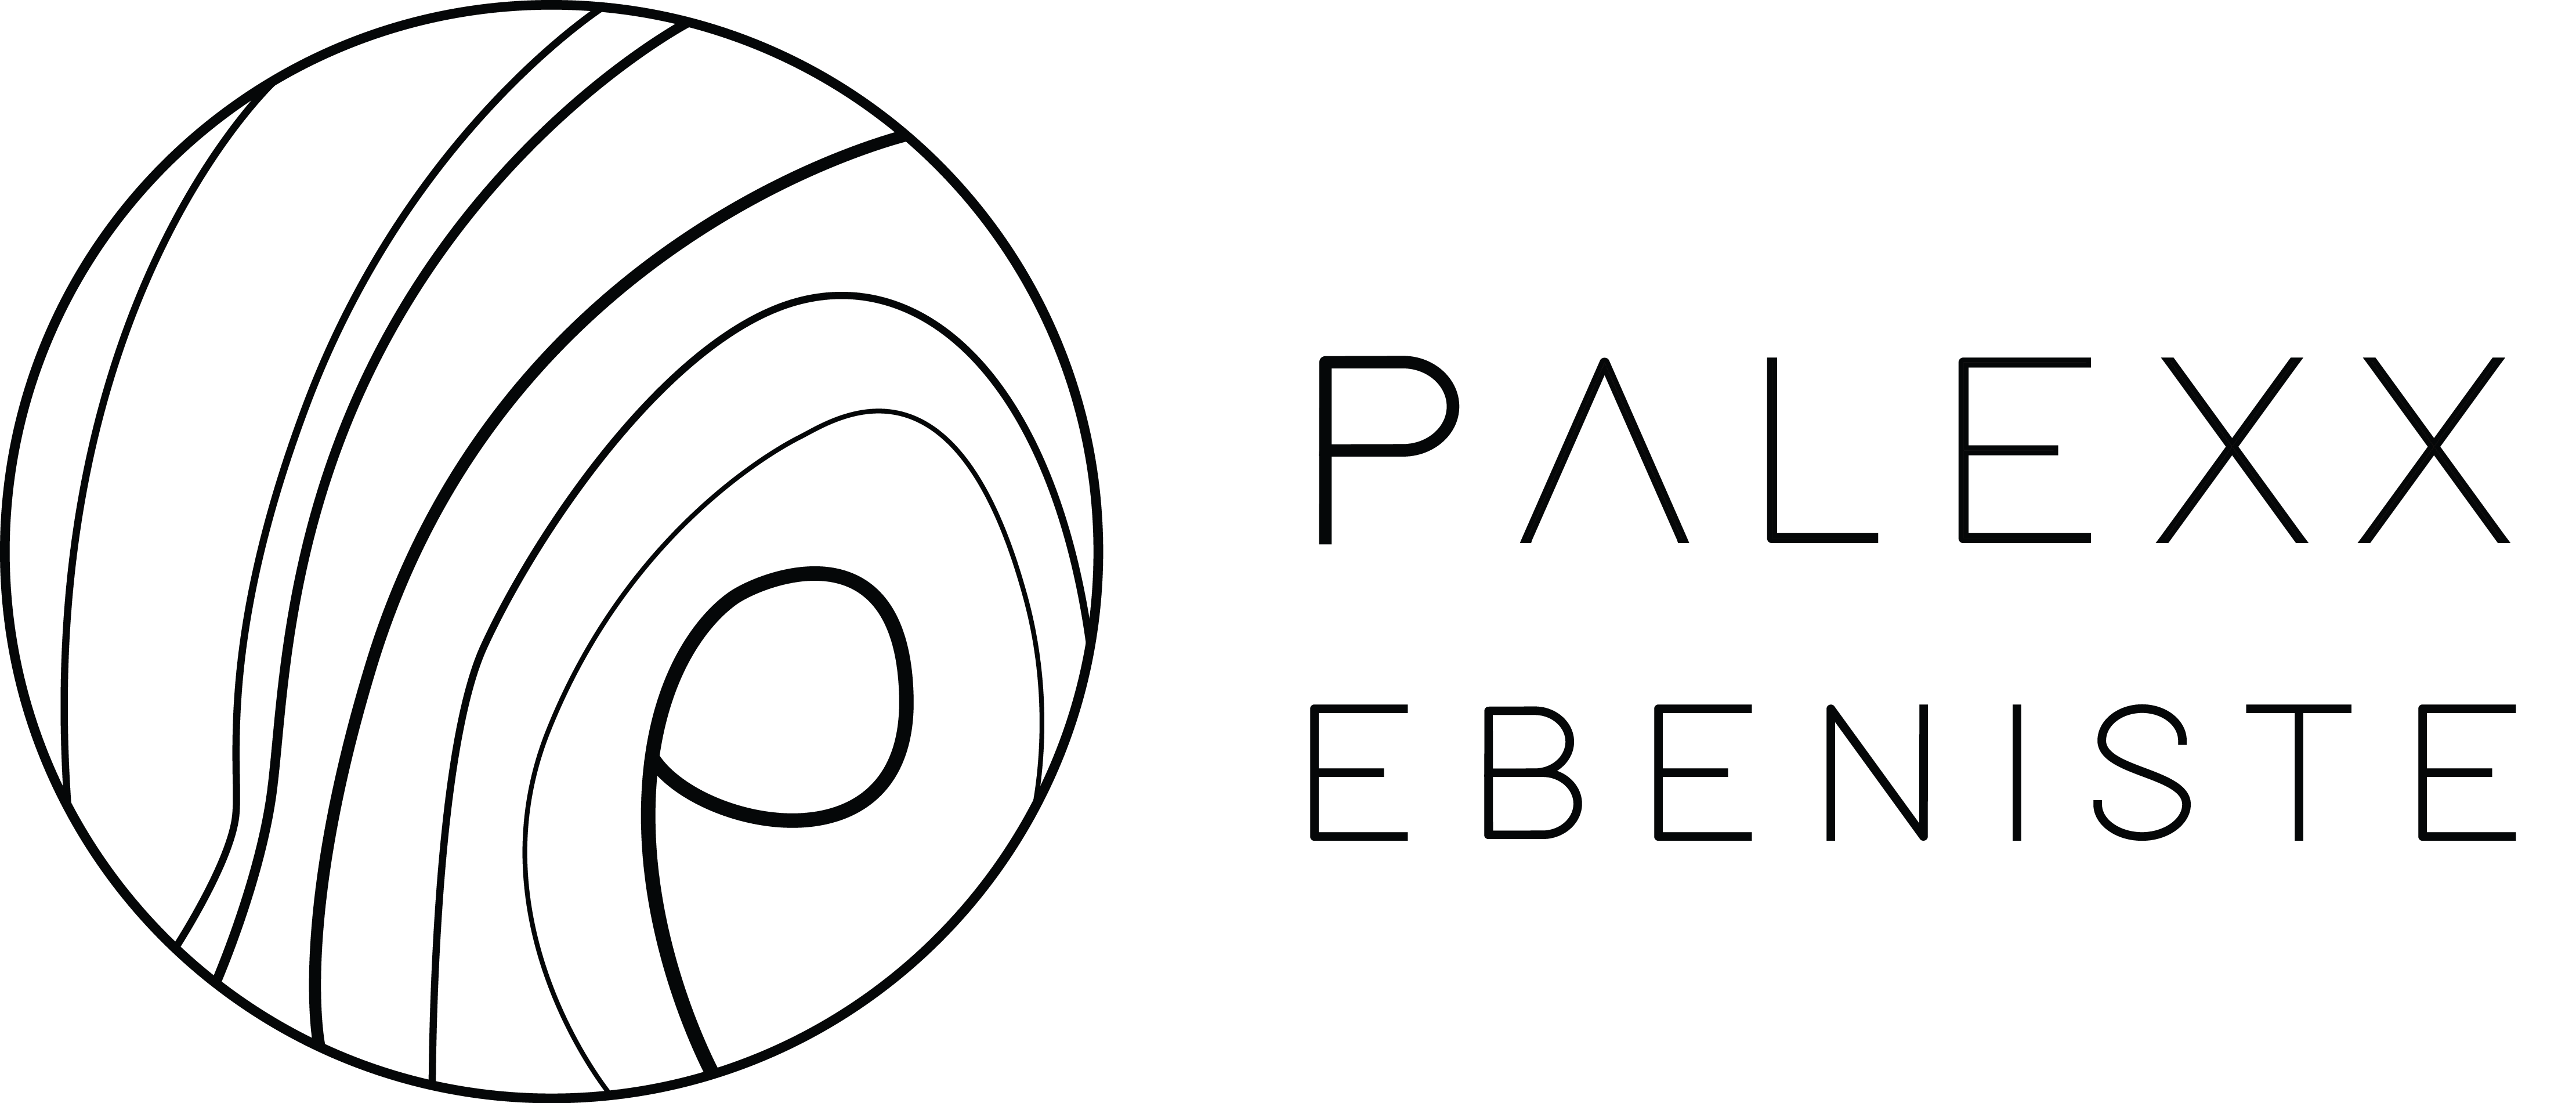 Palexx Ebeniste